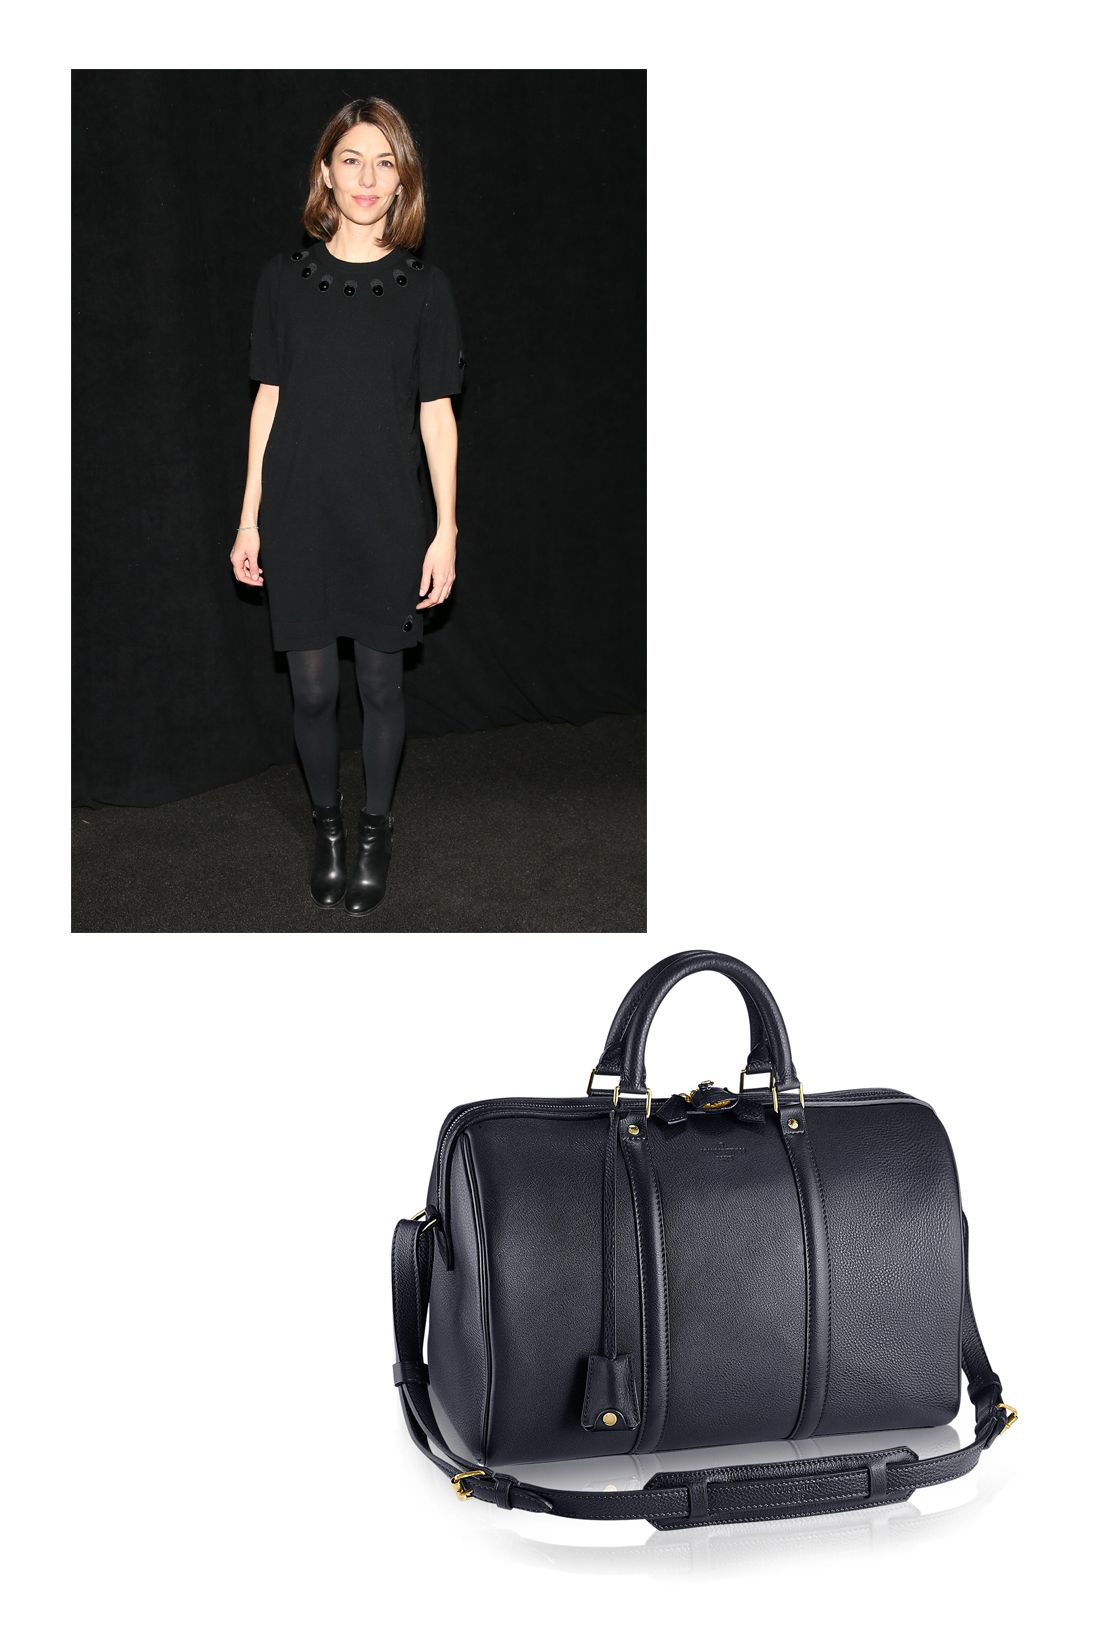 More Than Just Jane  The Women Who ve Inspired Iconic Handbags - Sofia  Coppola 0114e9f06081e